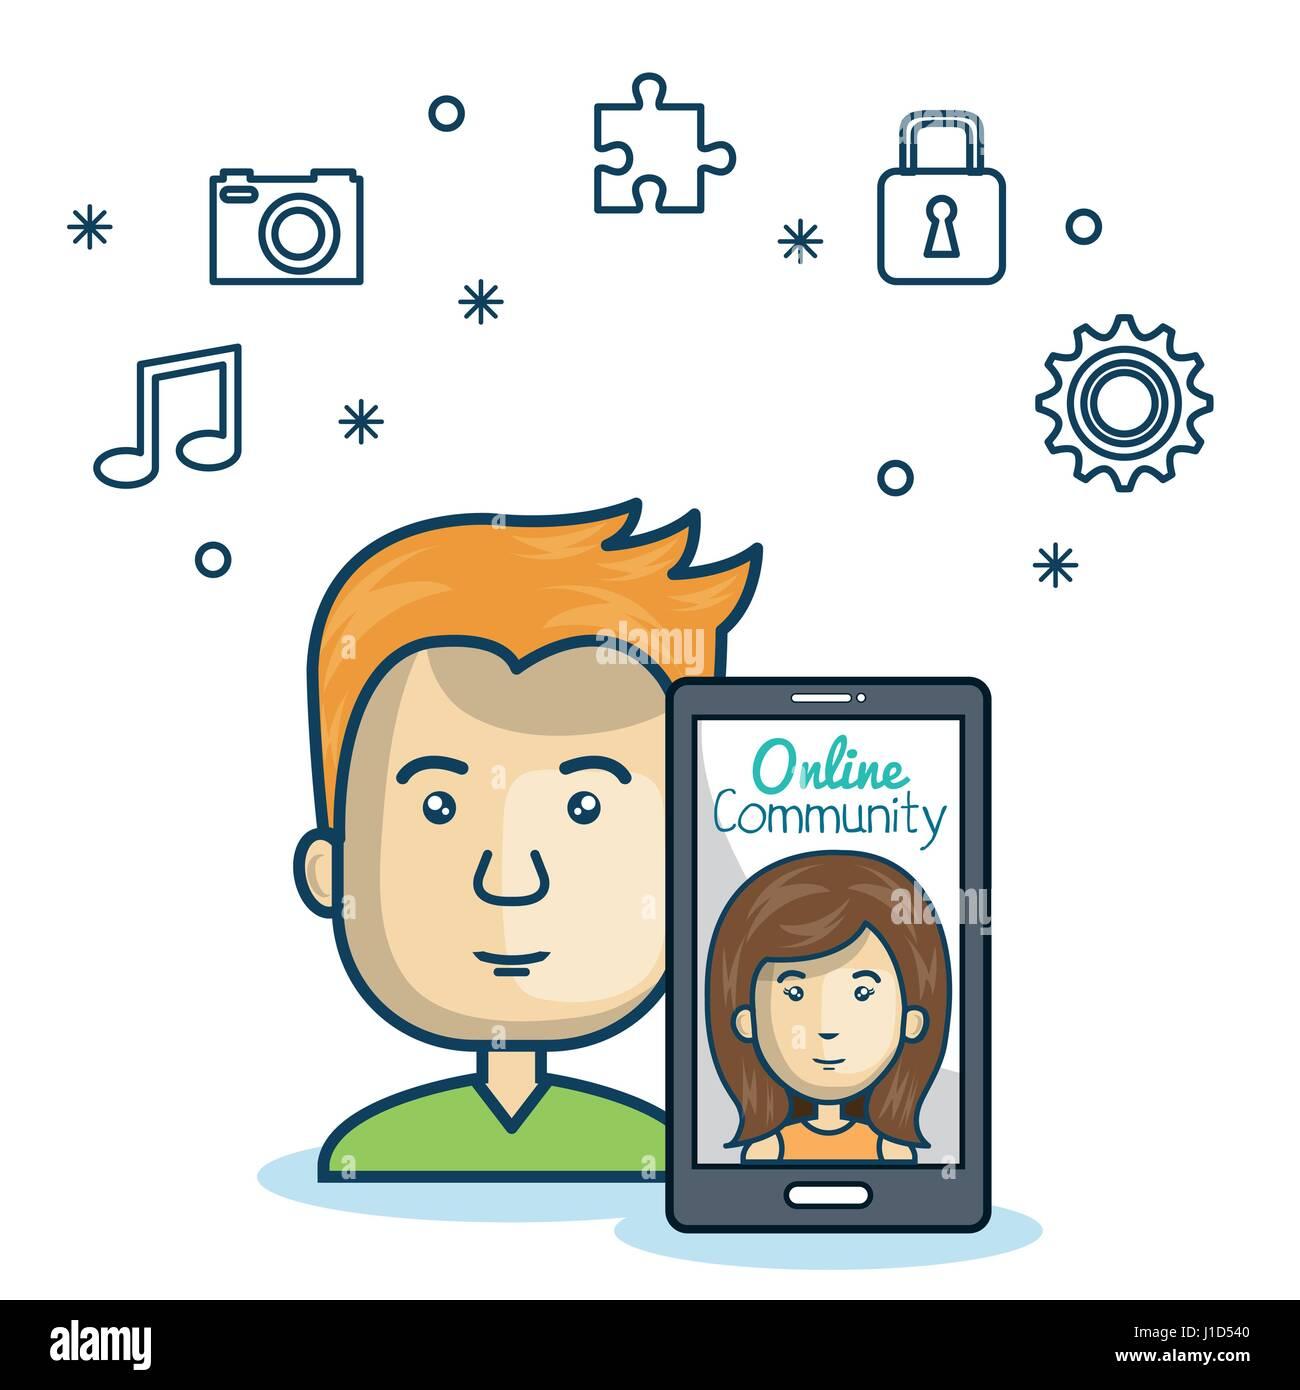 man community online smartphone with app media design - Stock Image